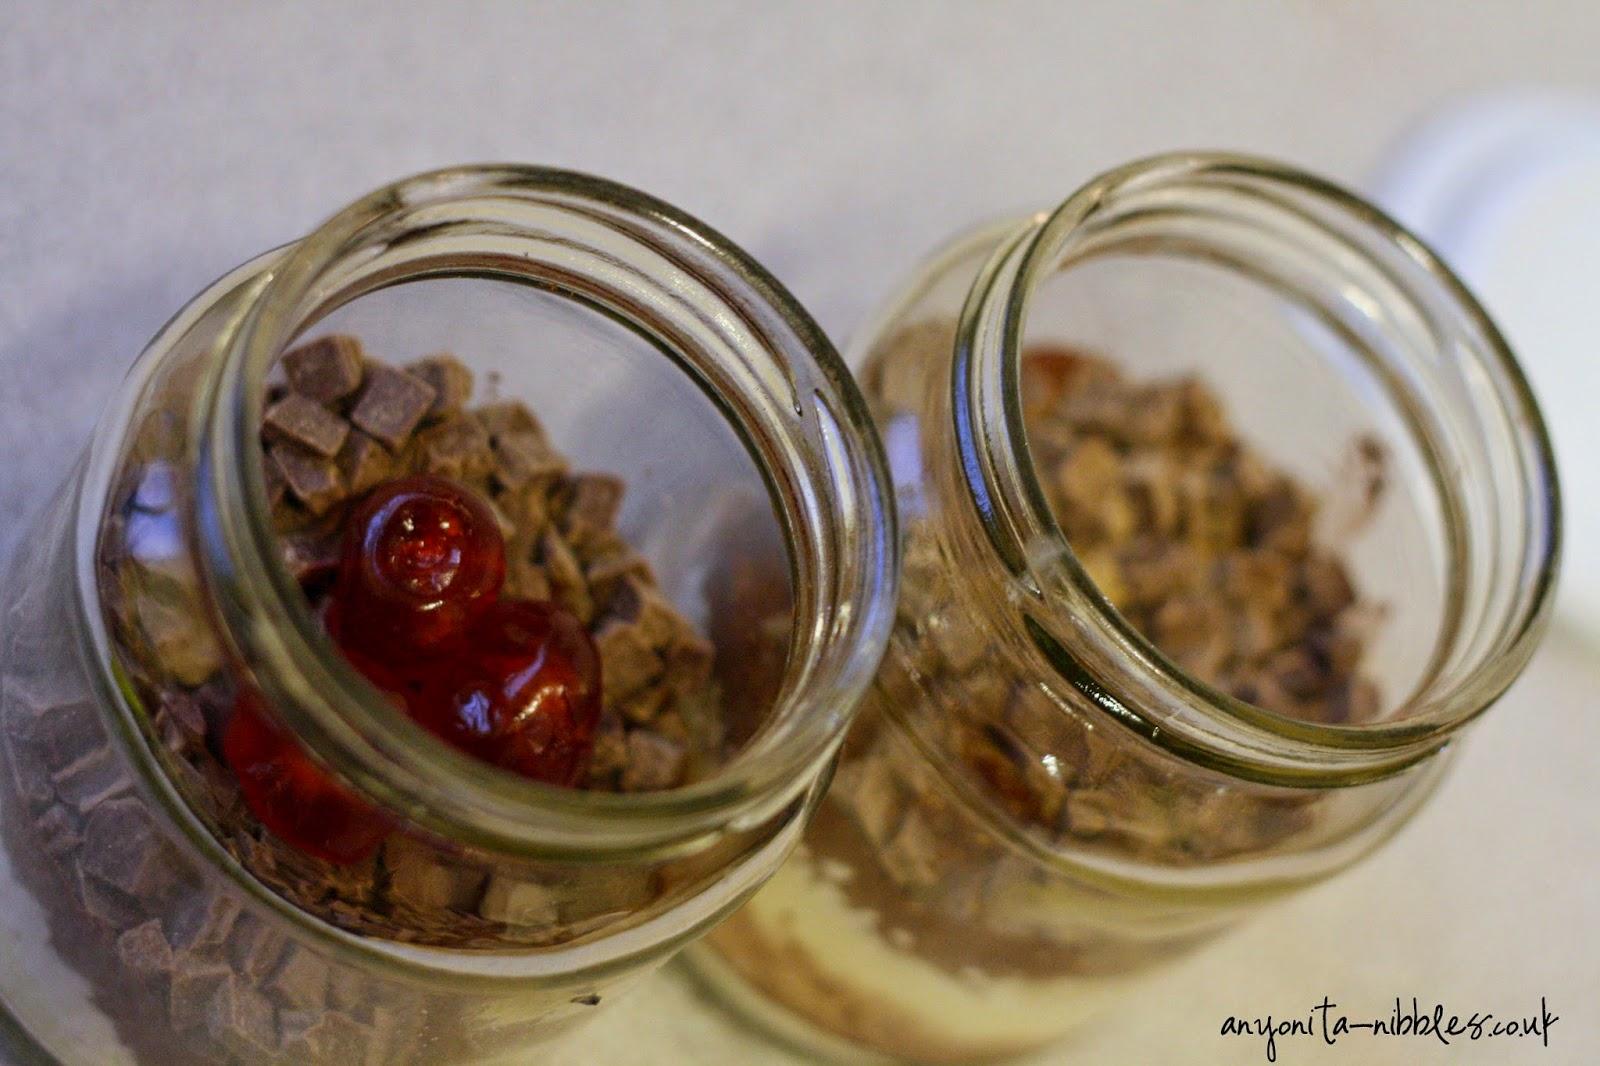 Two Jam Jar Cocoa Treats from Anyonita-nibbles.co.uk